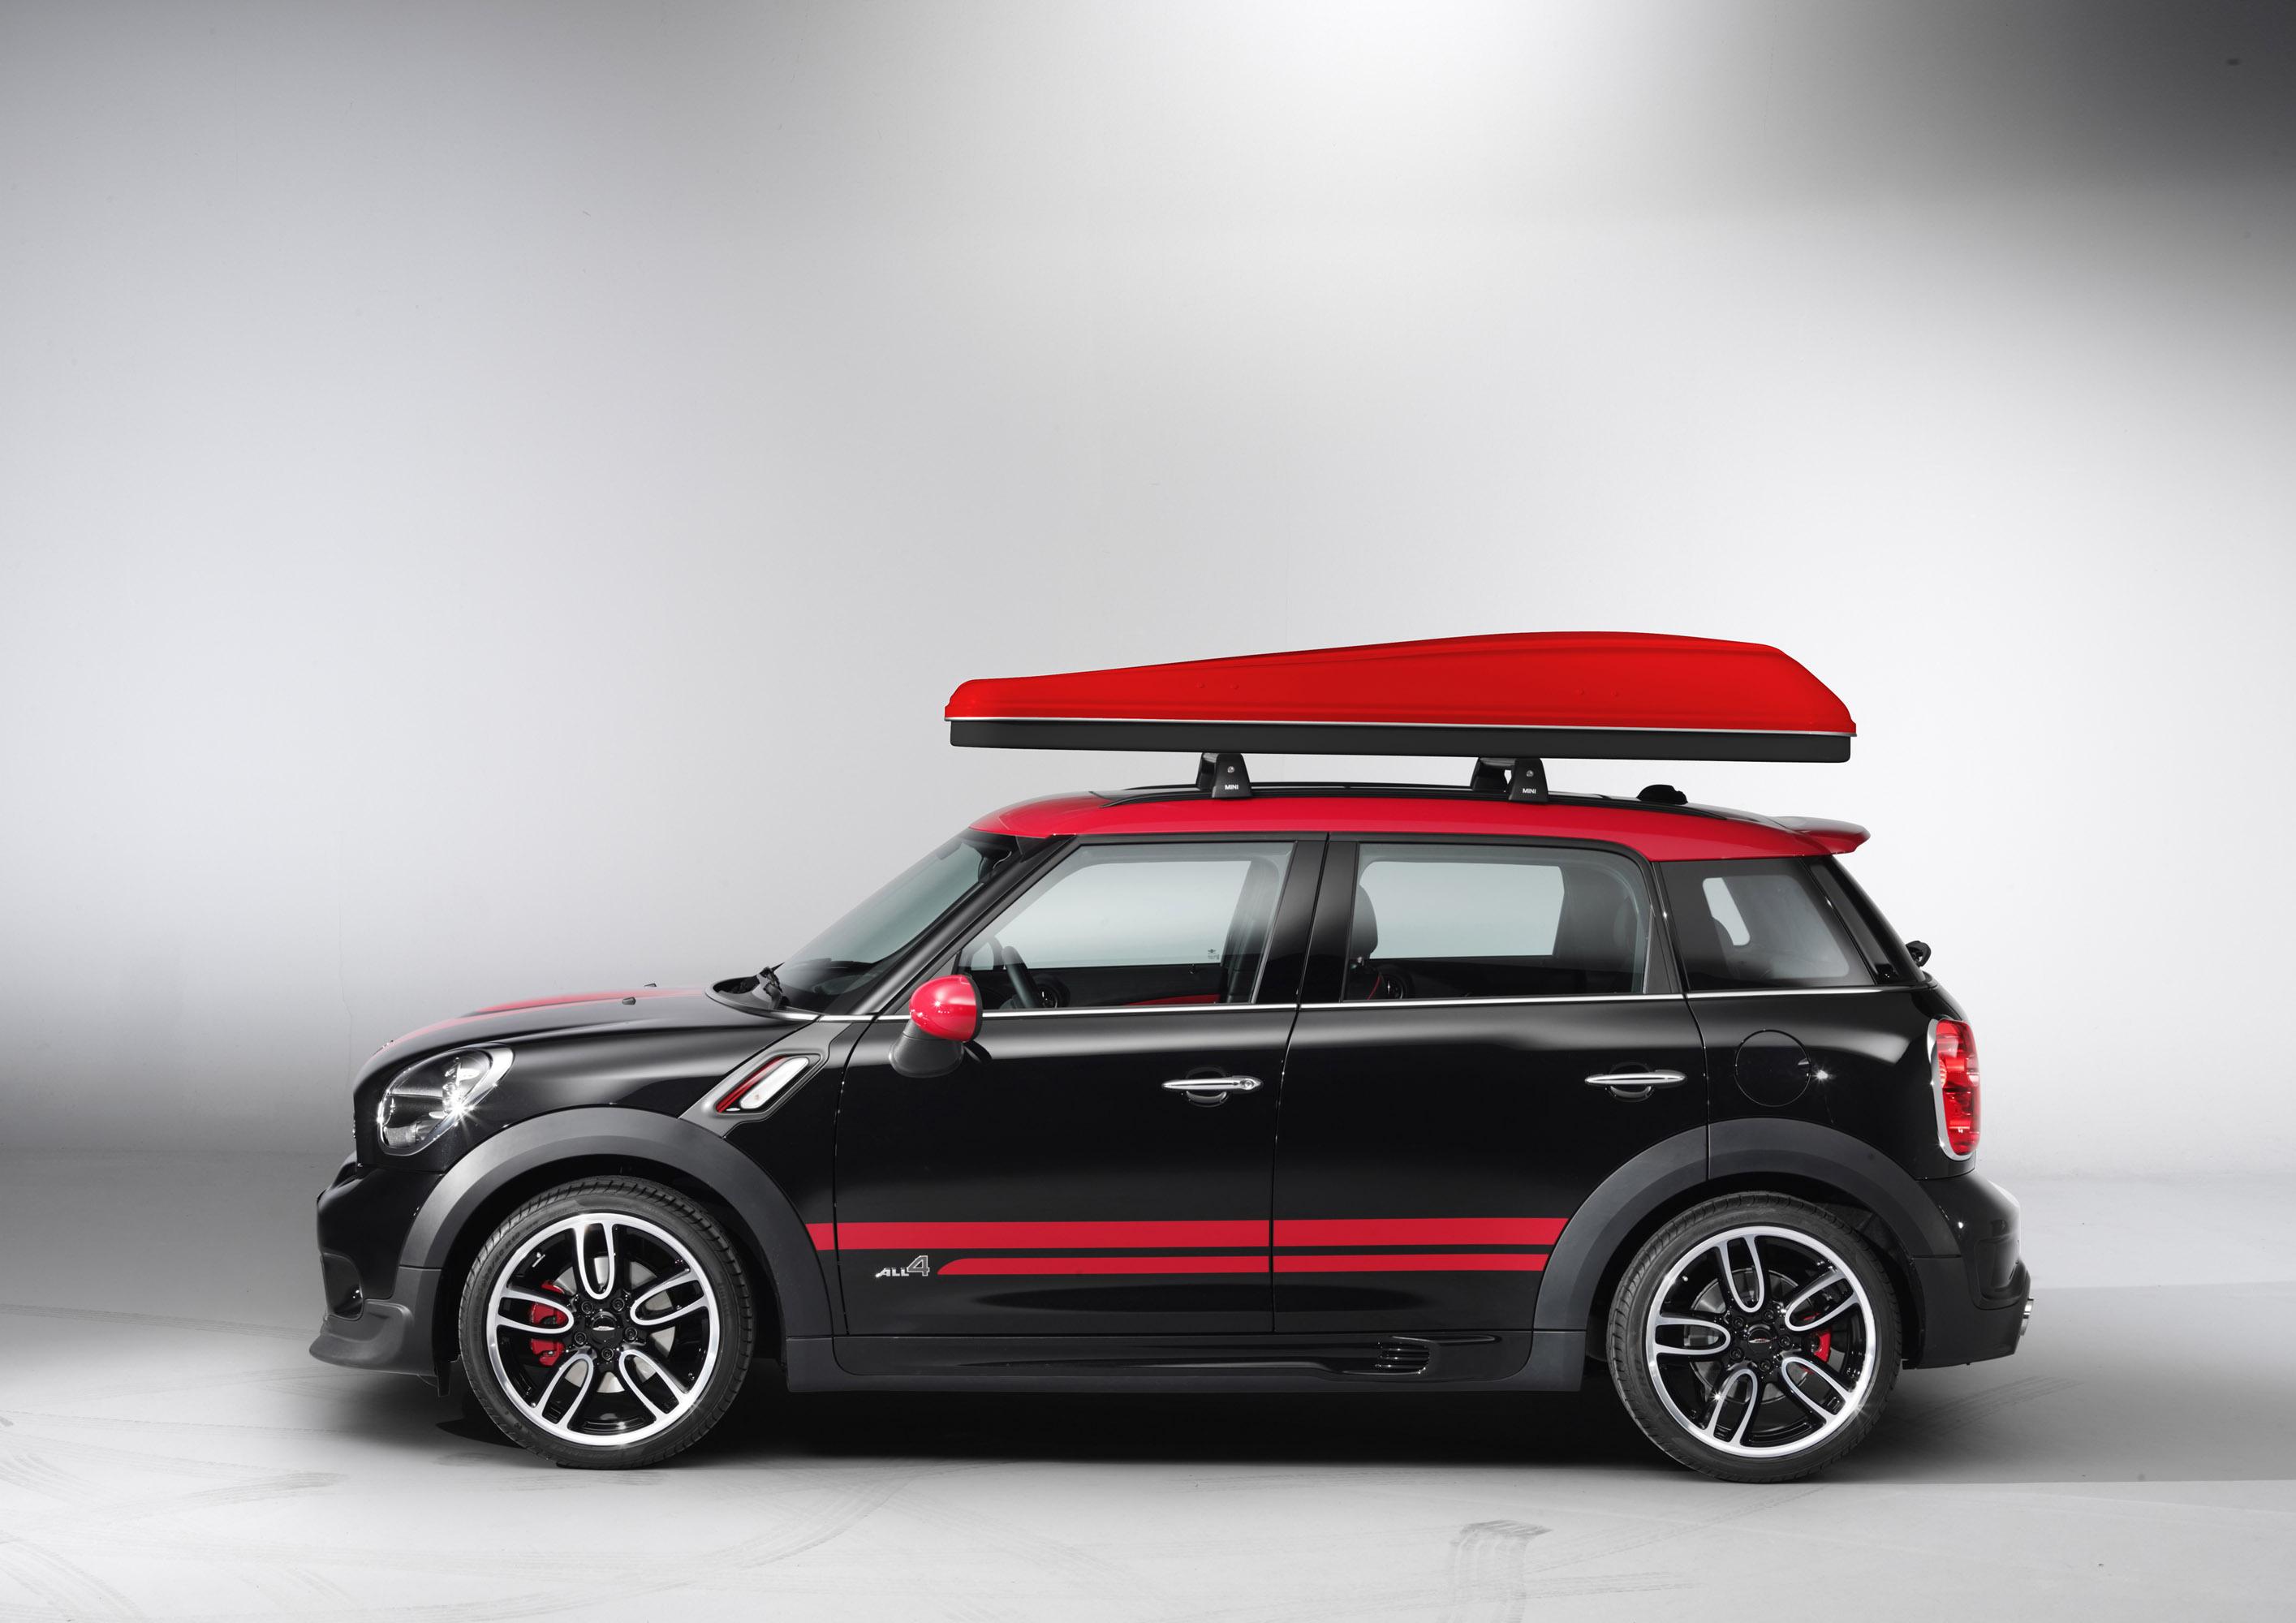 Mini Goes Camping With Mini Cowley Caravan And Mini